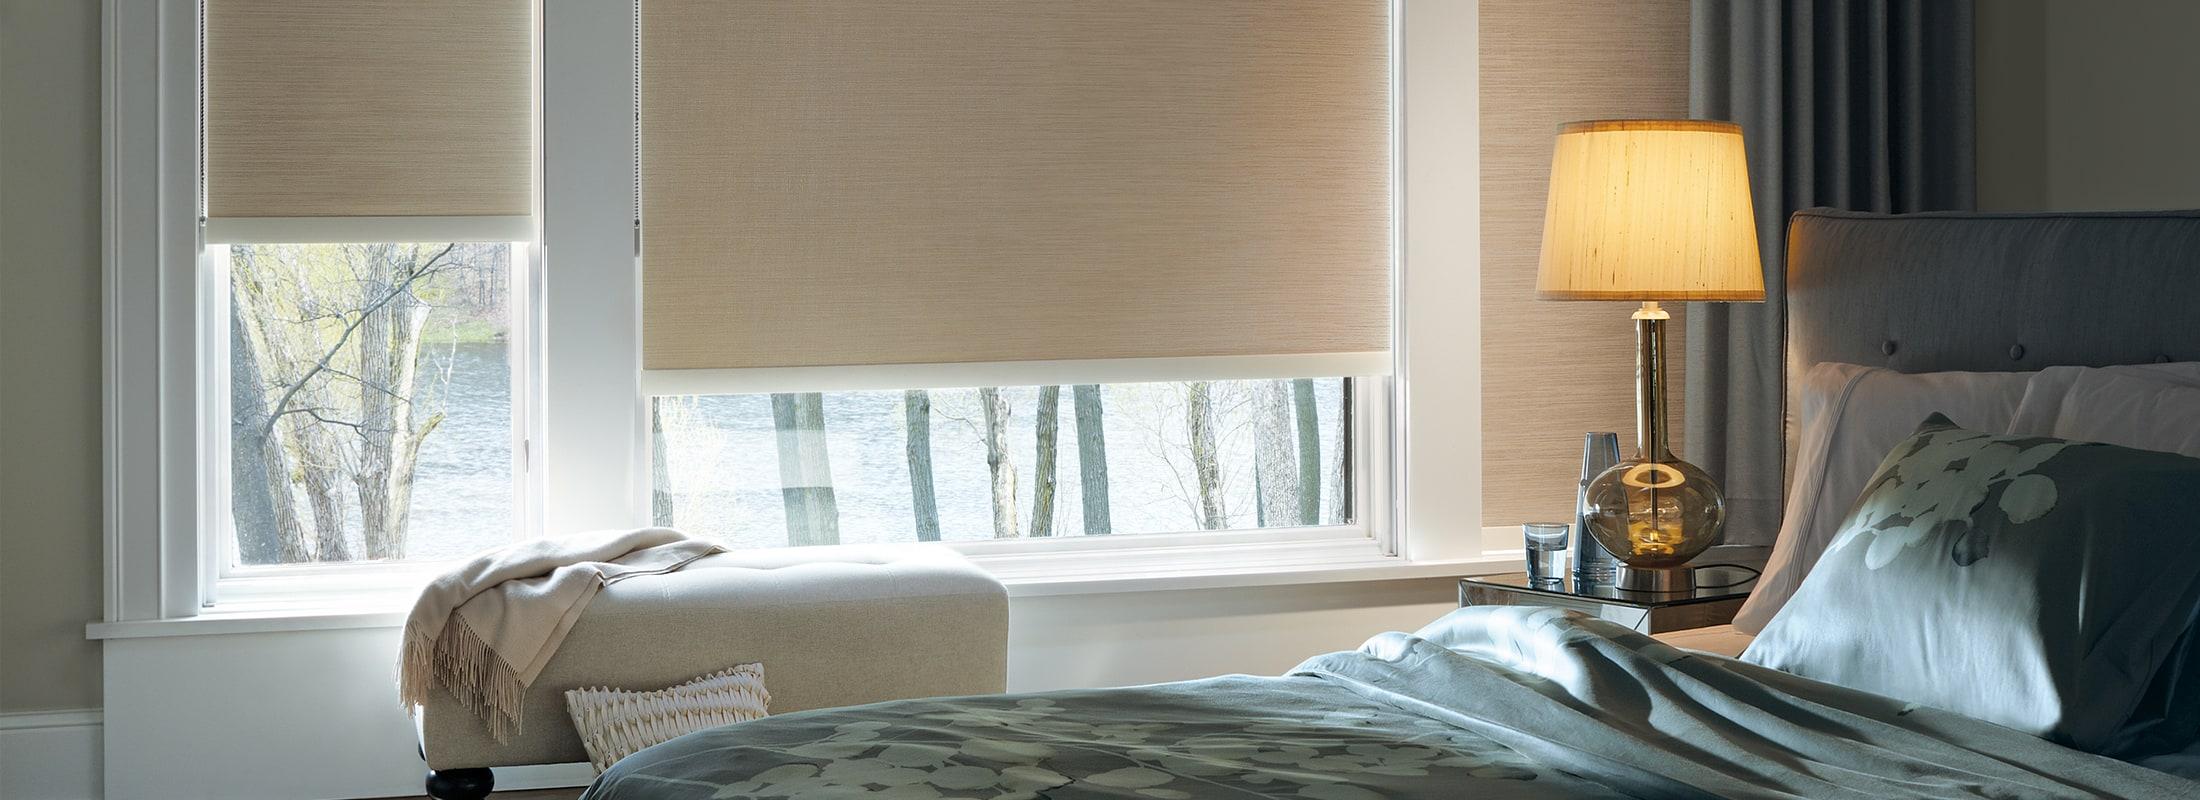 fabric-roller-shades-designer-roller-shades-carousel-02_0.jpg